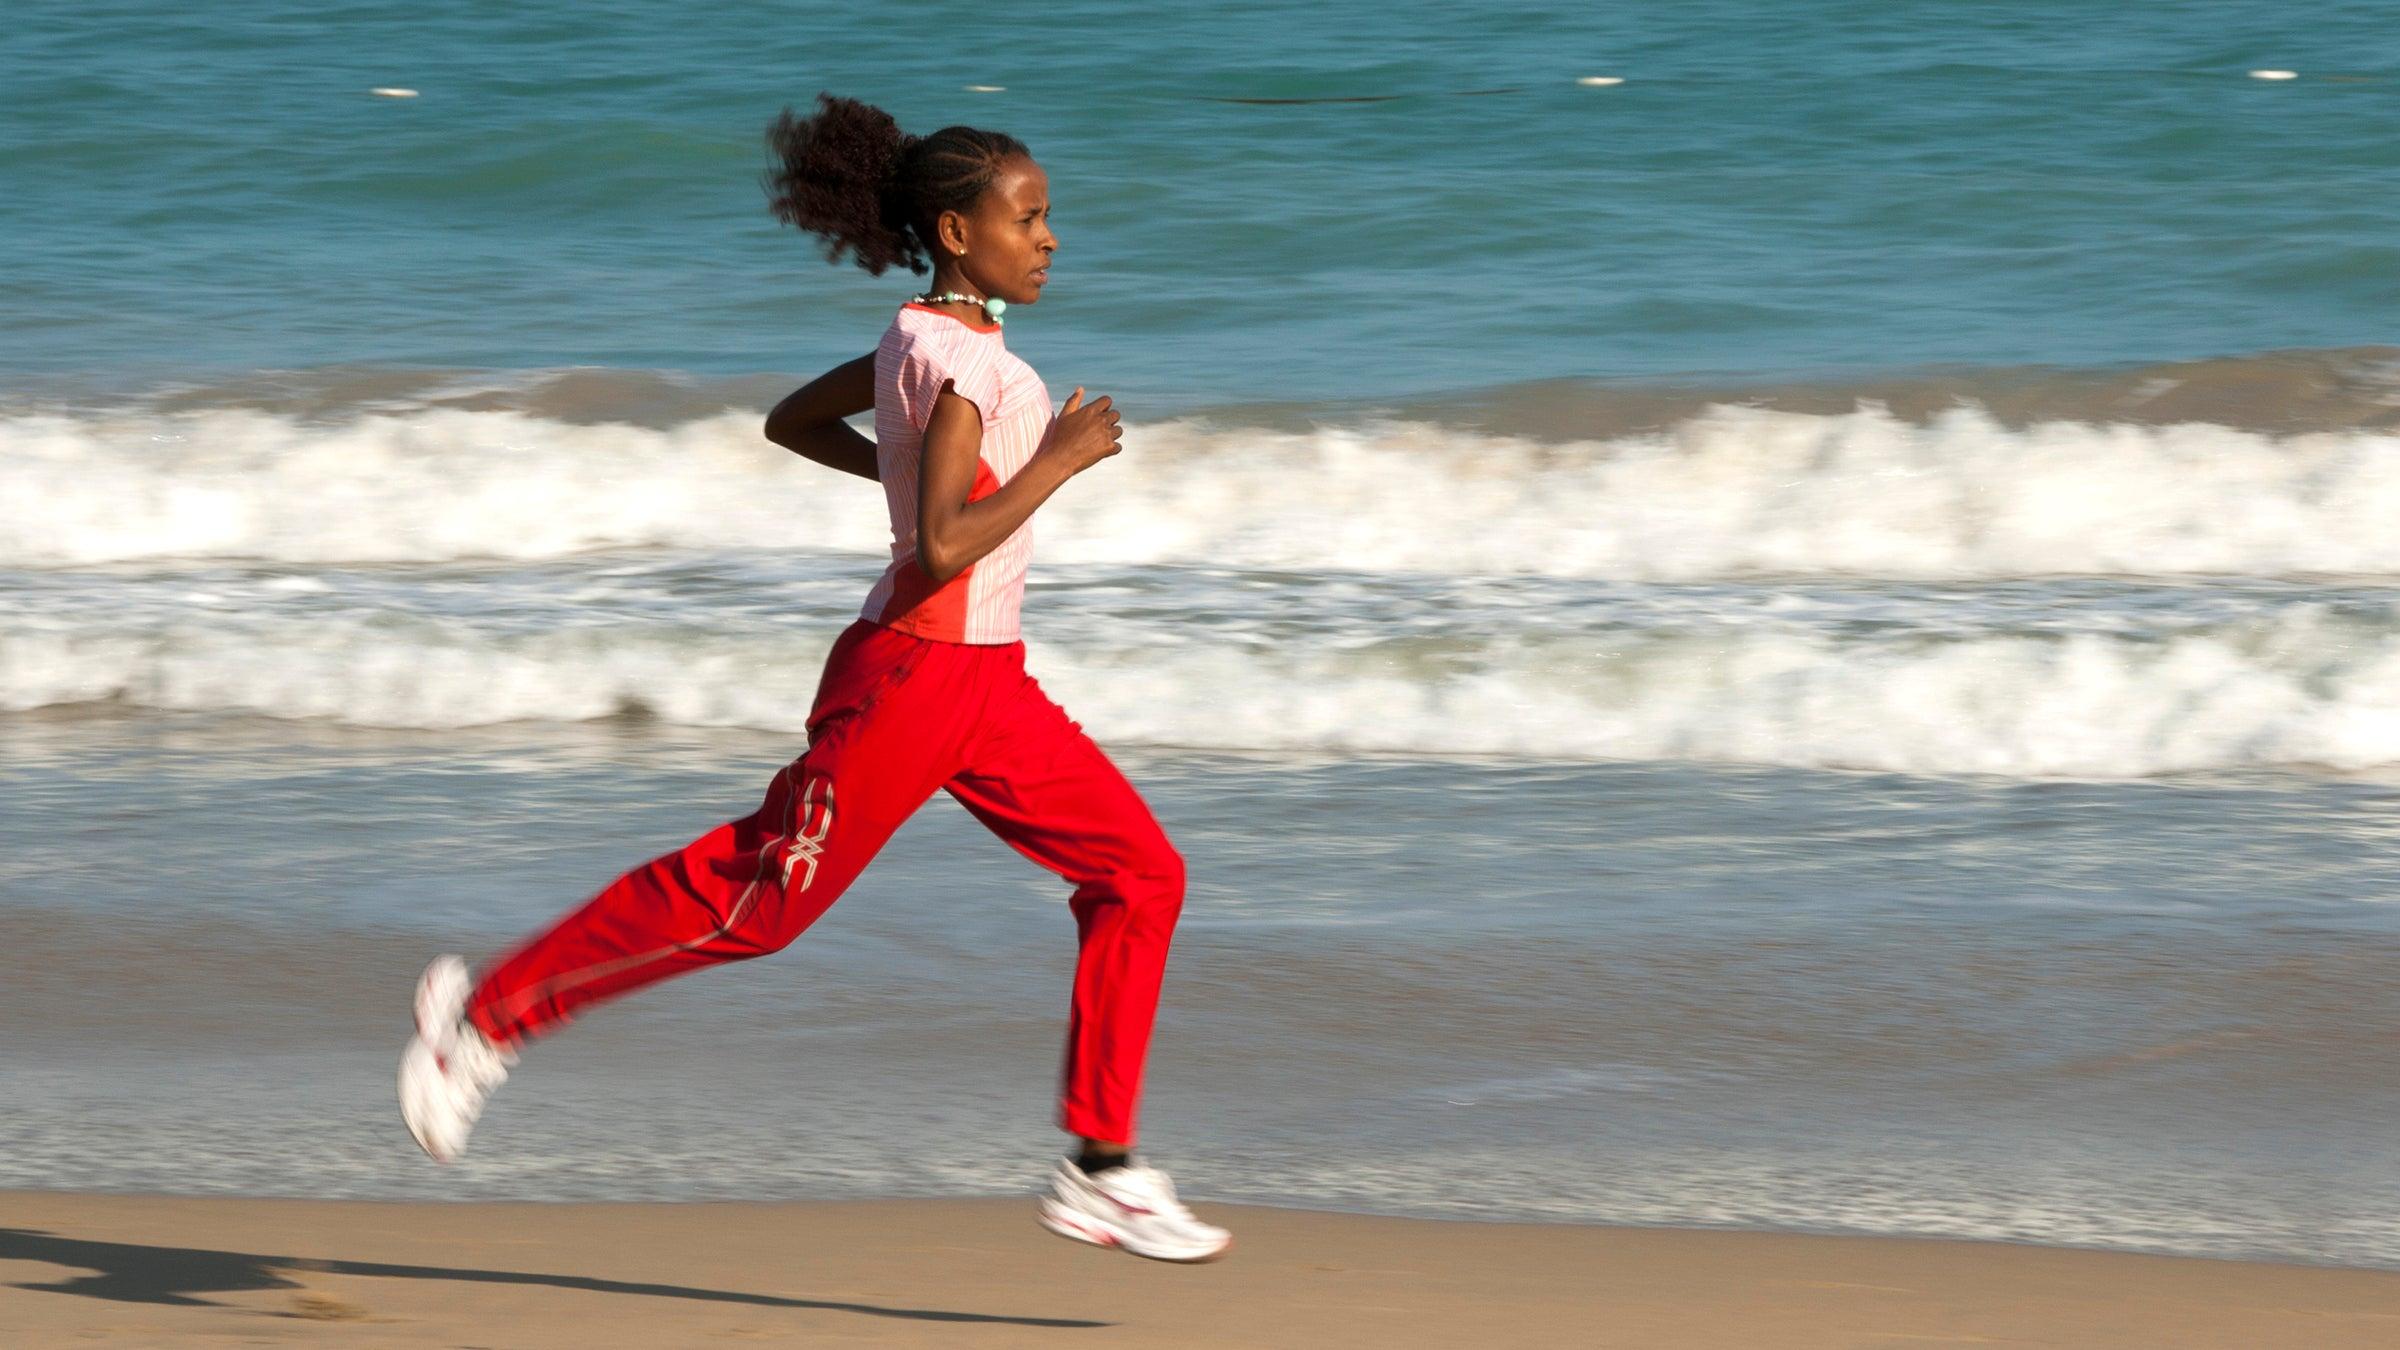 Running - Marathon running Insights 🏃🏻 cover image